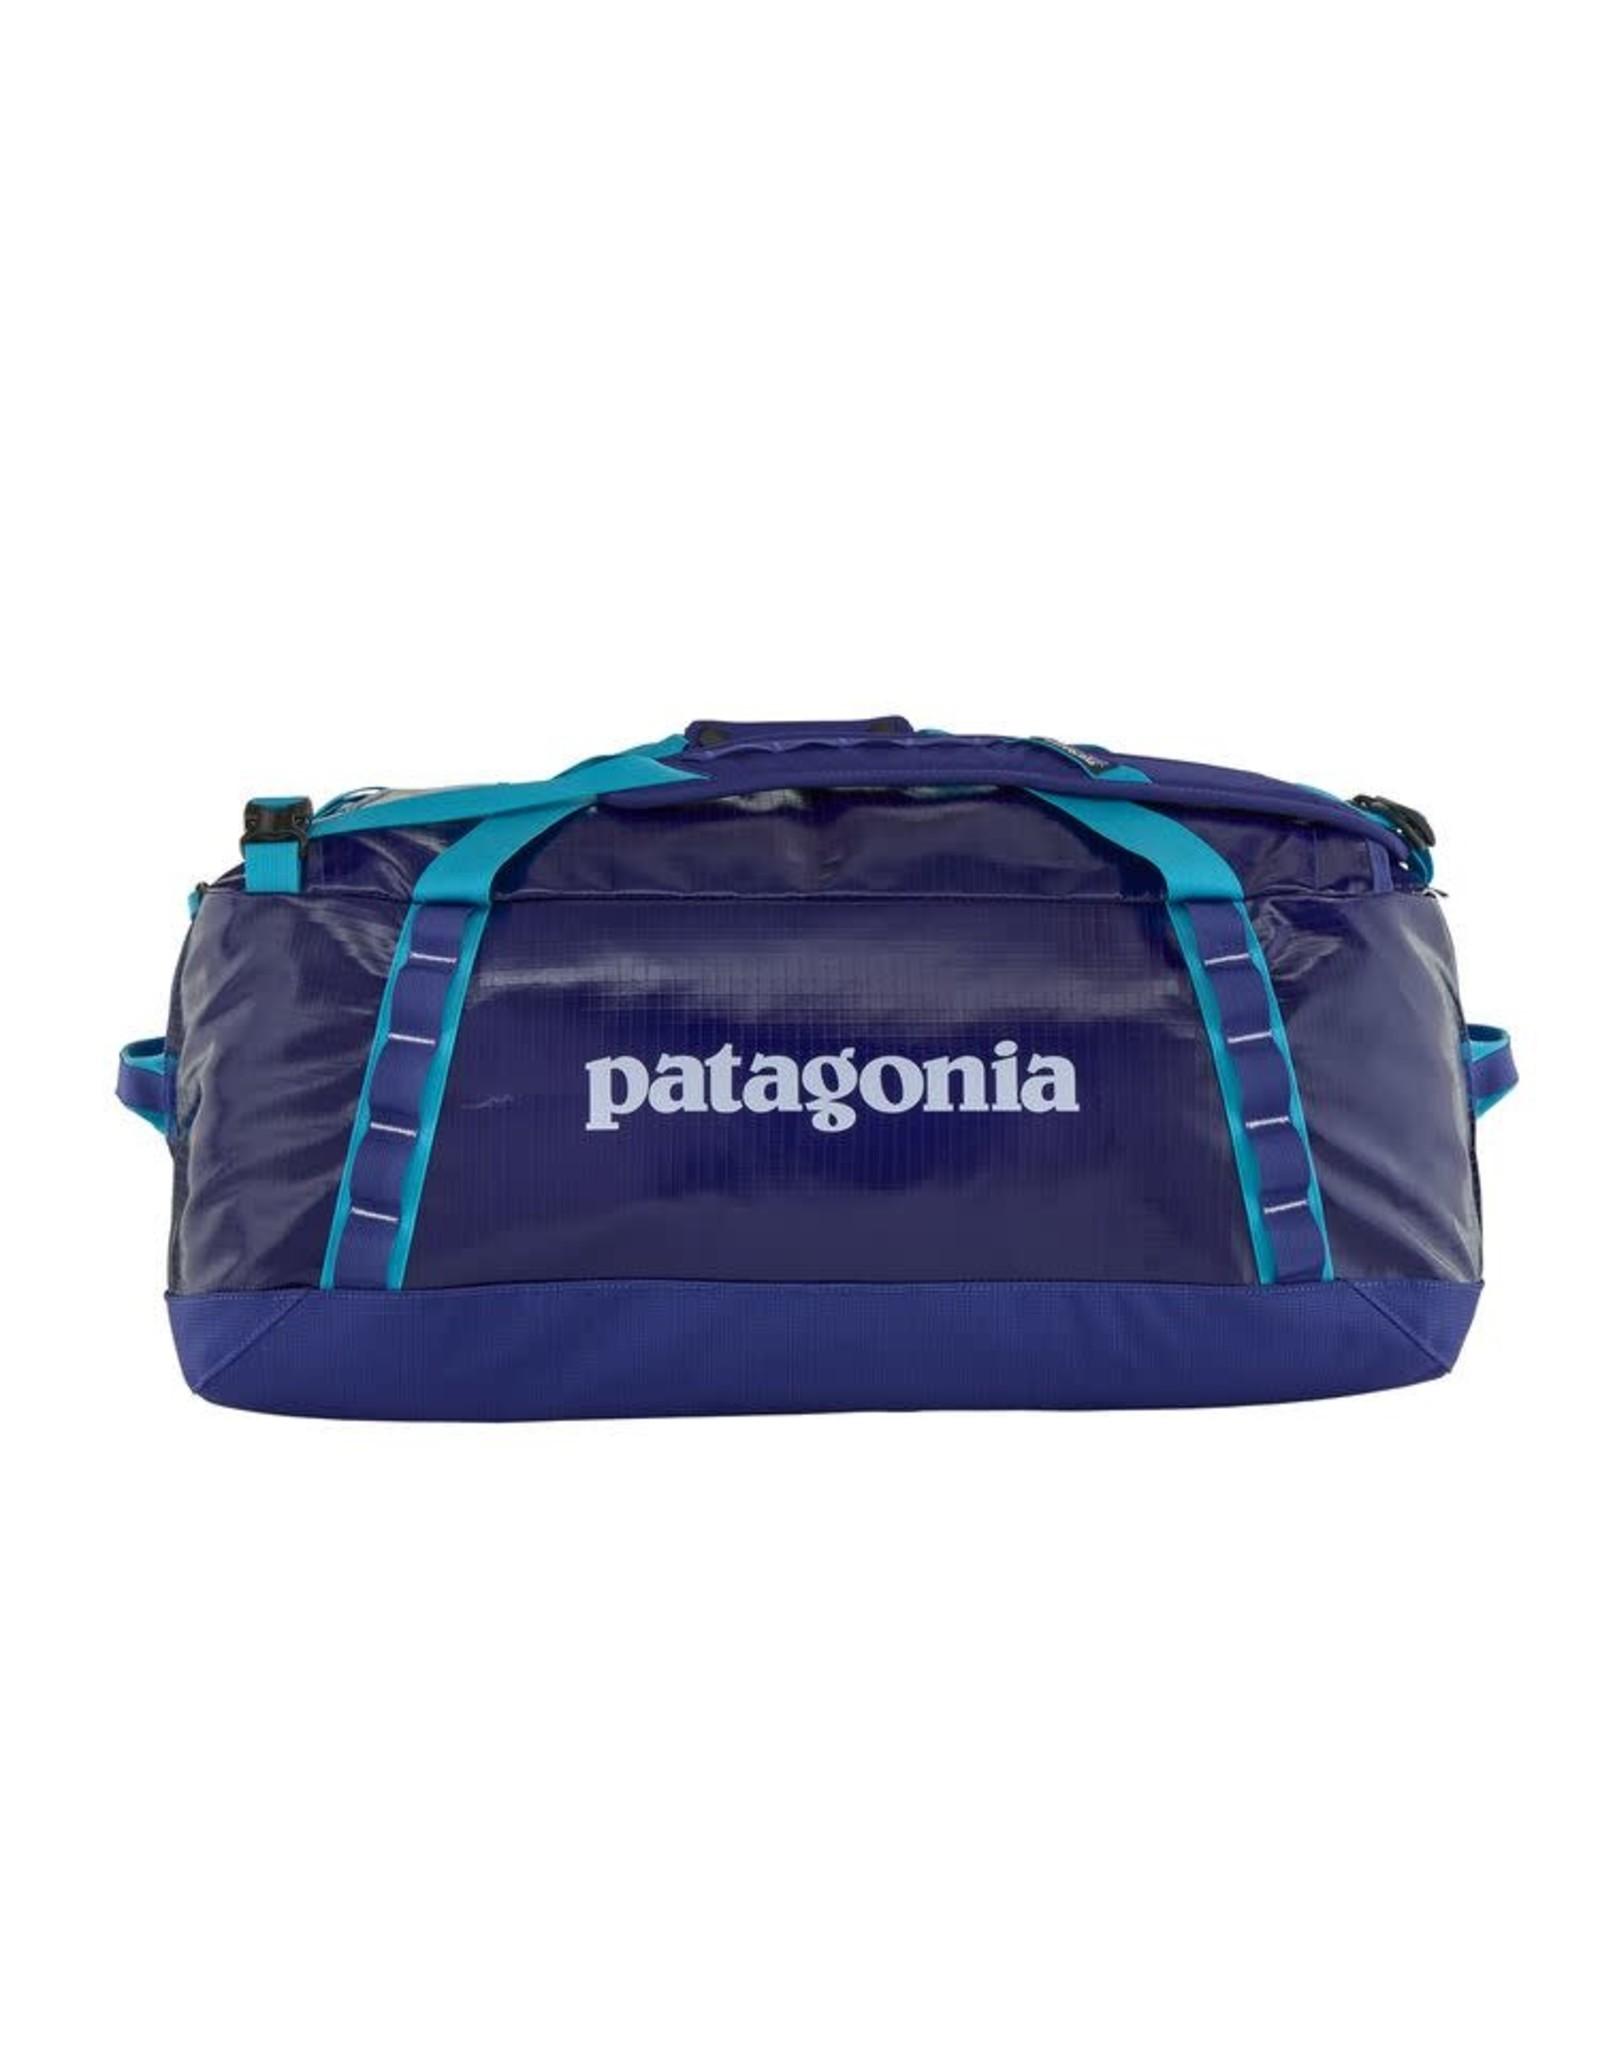 Patagonia Patagonia Black Hole Duffel - 55L - Cobalt Blue